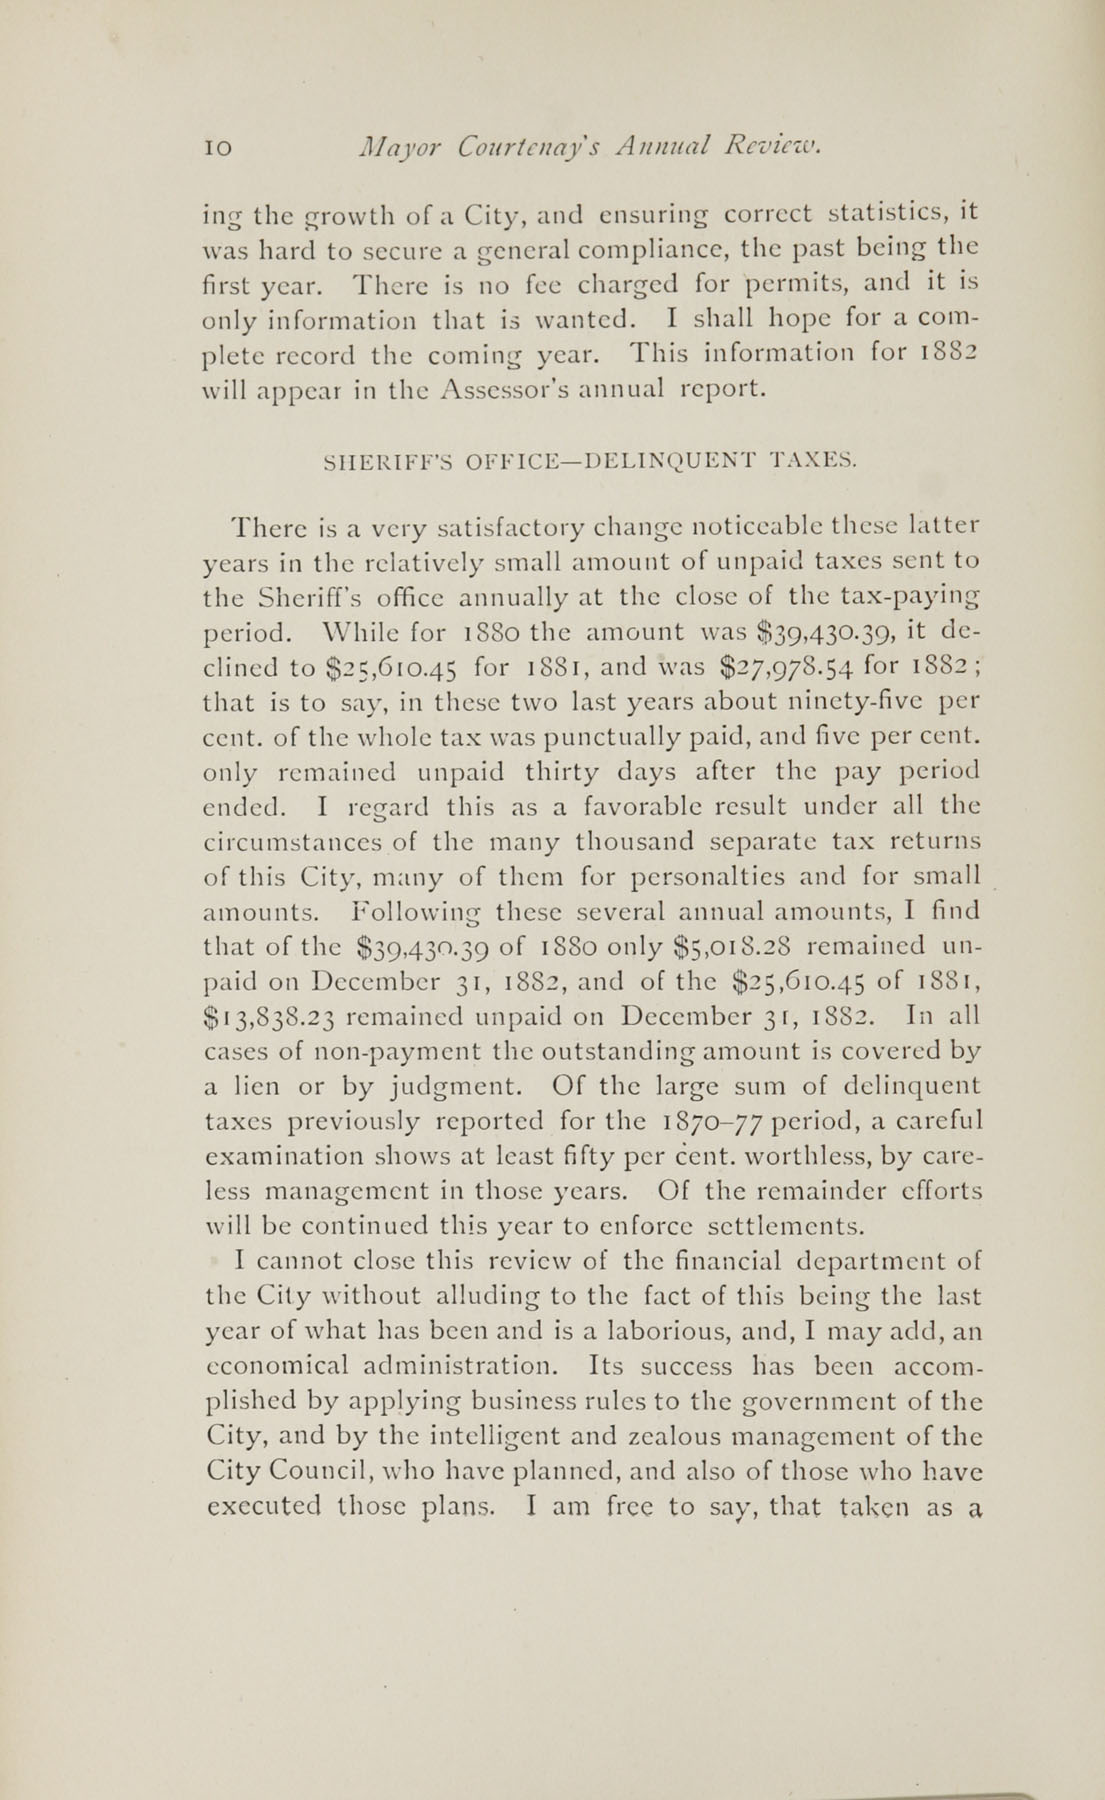 Charleston Yearbook, 1882, page 10